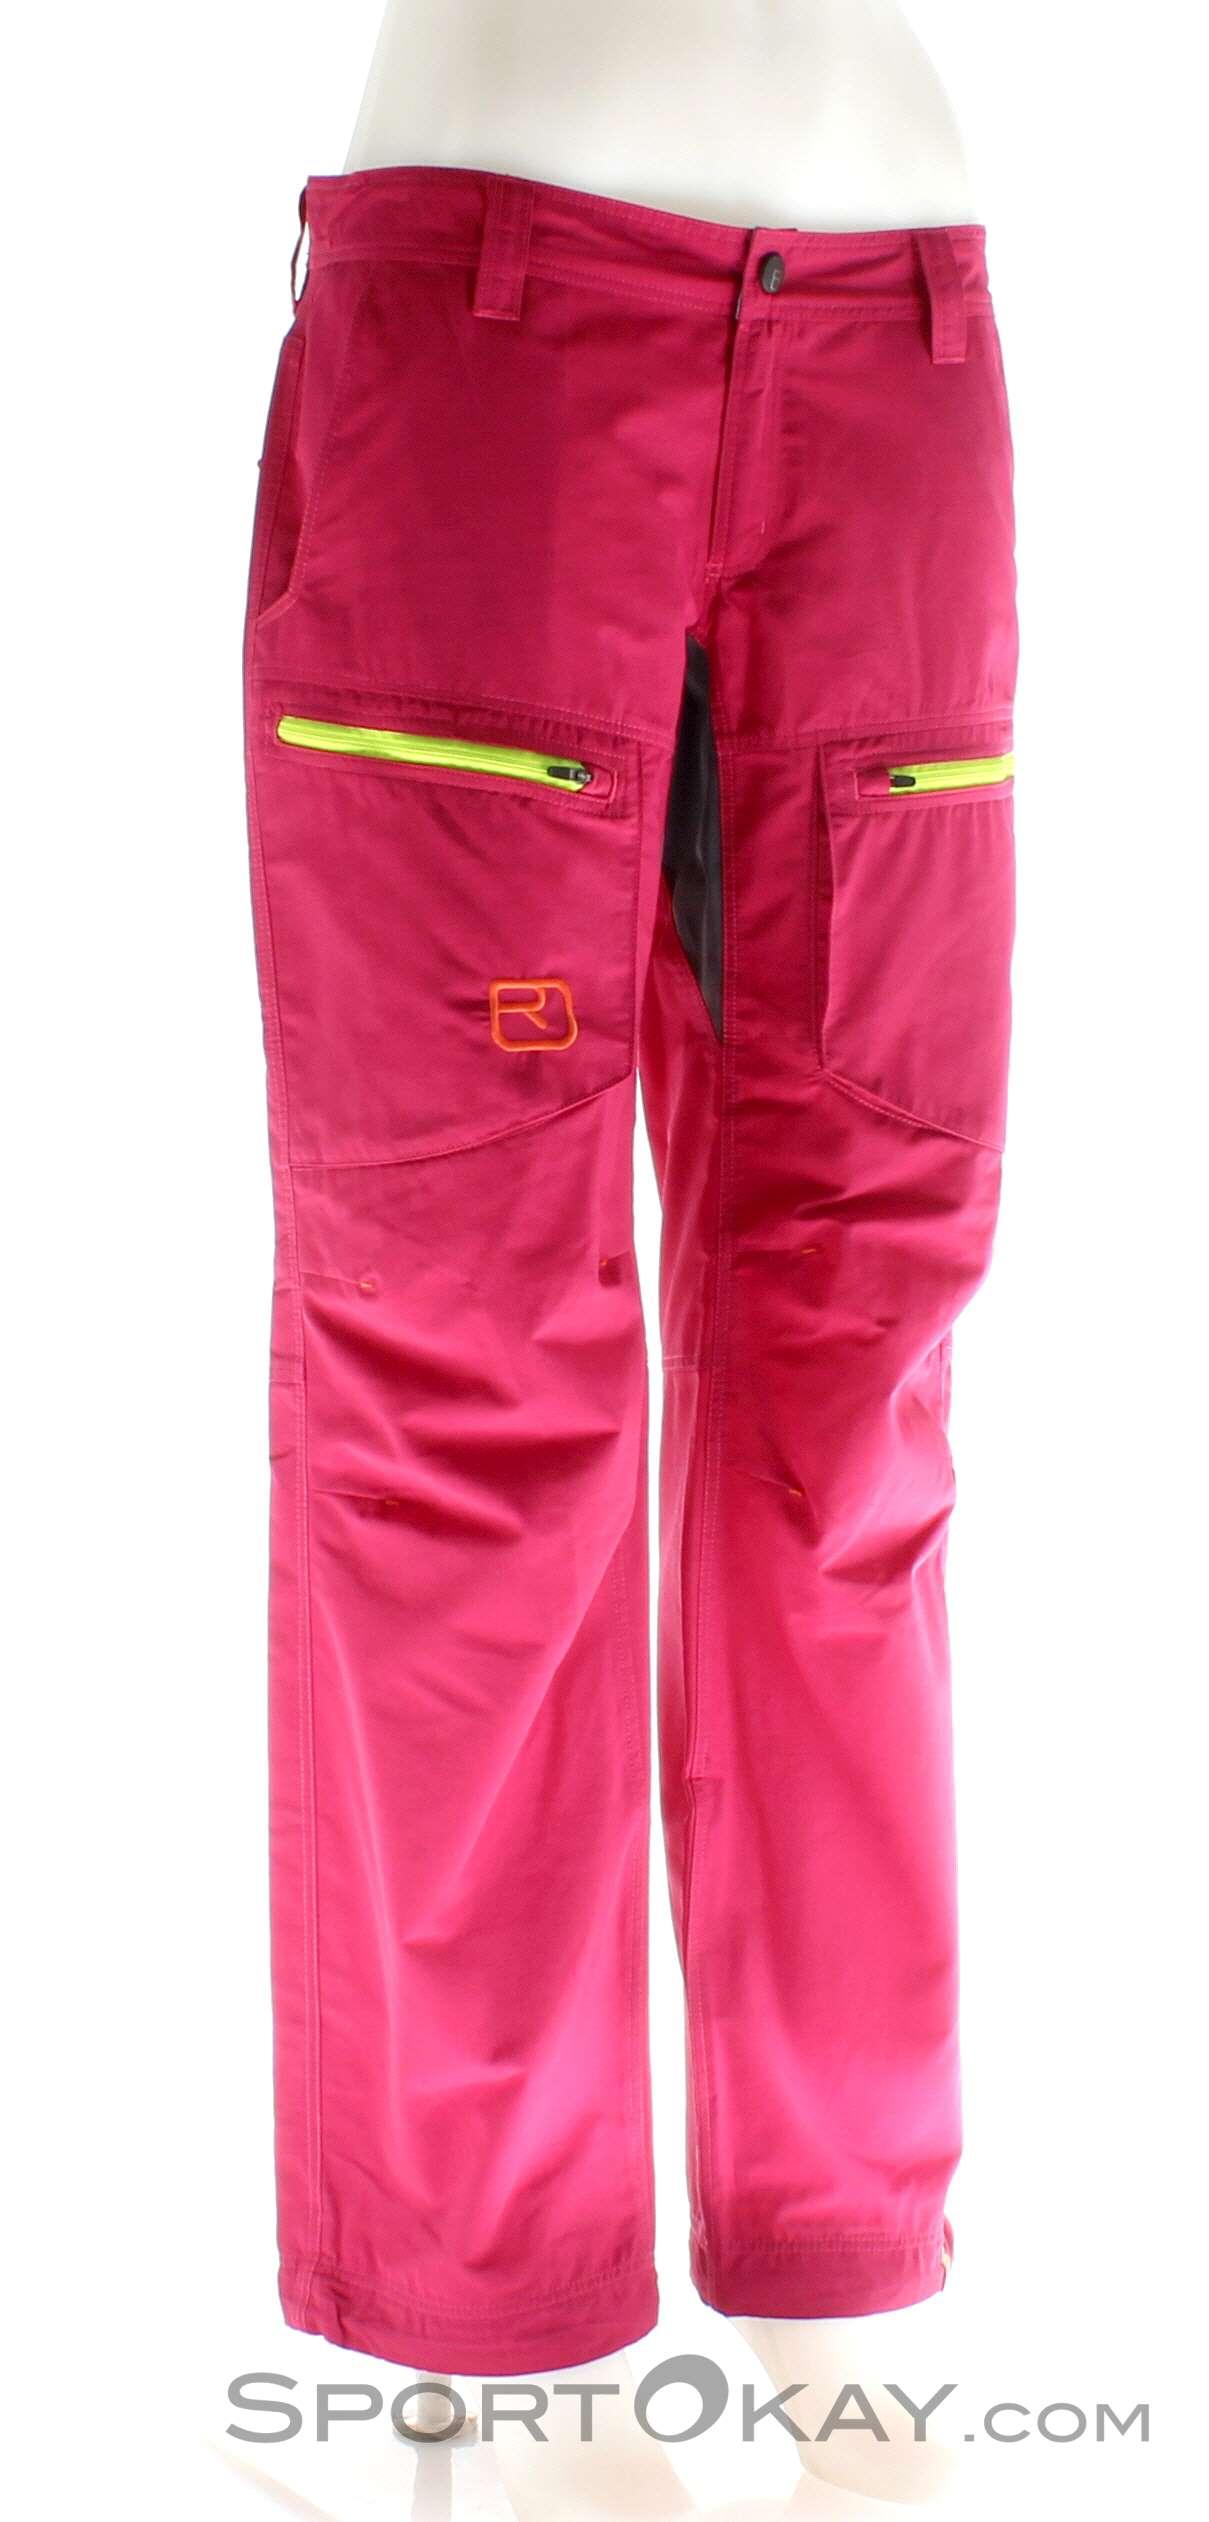 Ortovox Shield Vintage Pants Cargo Damen Outdoorhose, Ortovox, Lila, , Damen, 0016-10569, 5637558670, 4250875215900, N1-01.jpg